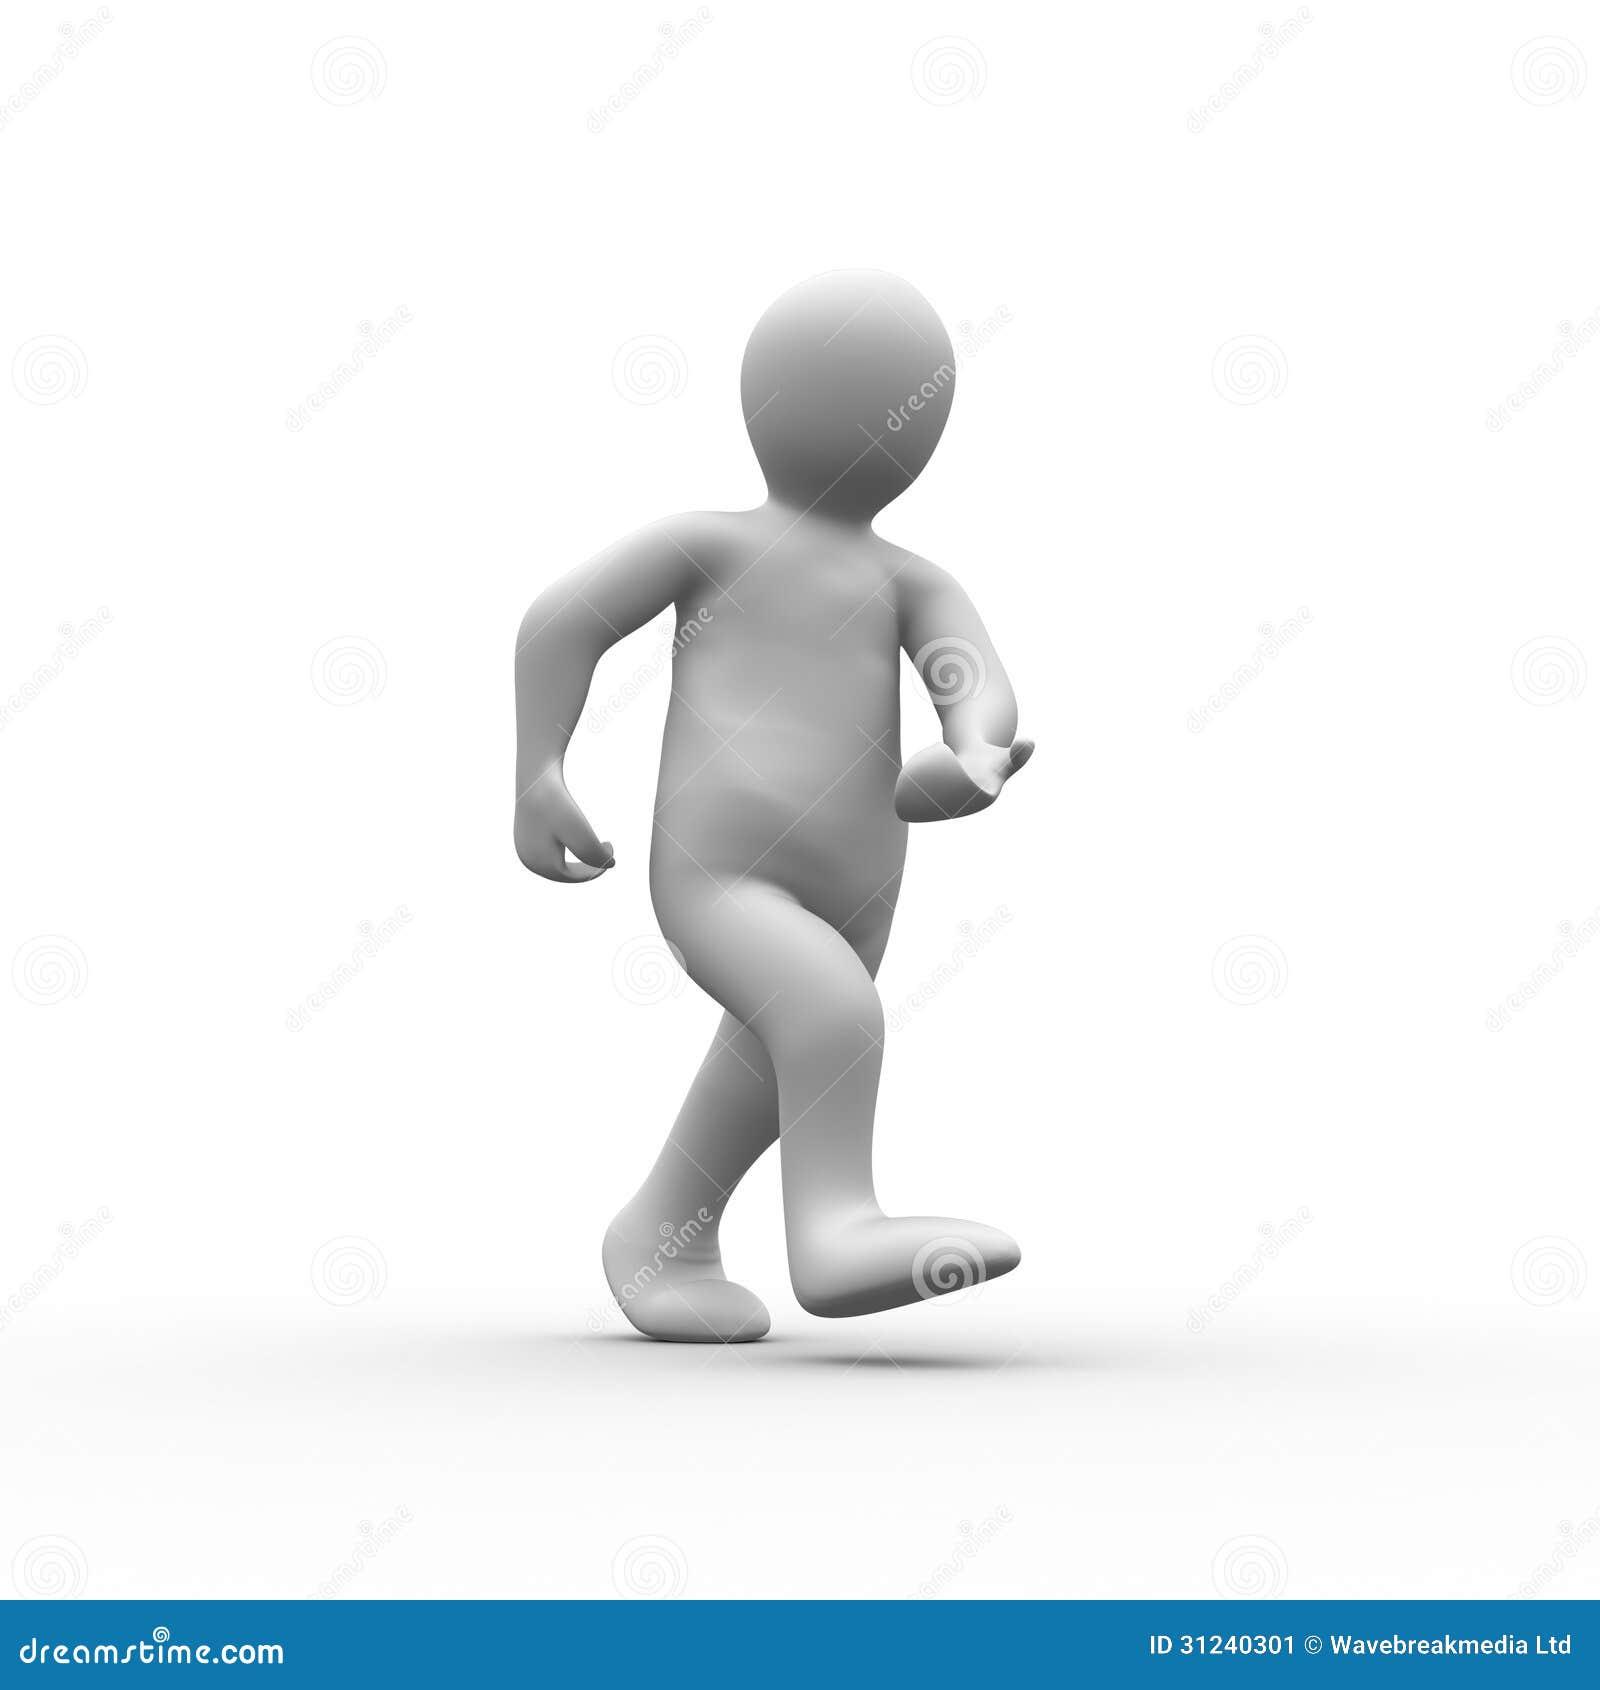 White Human Figure Walking Stock Image - Image: 31240301